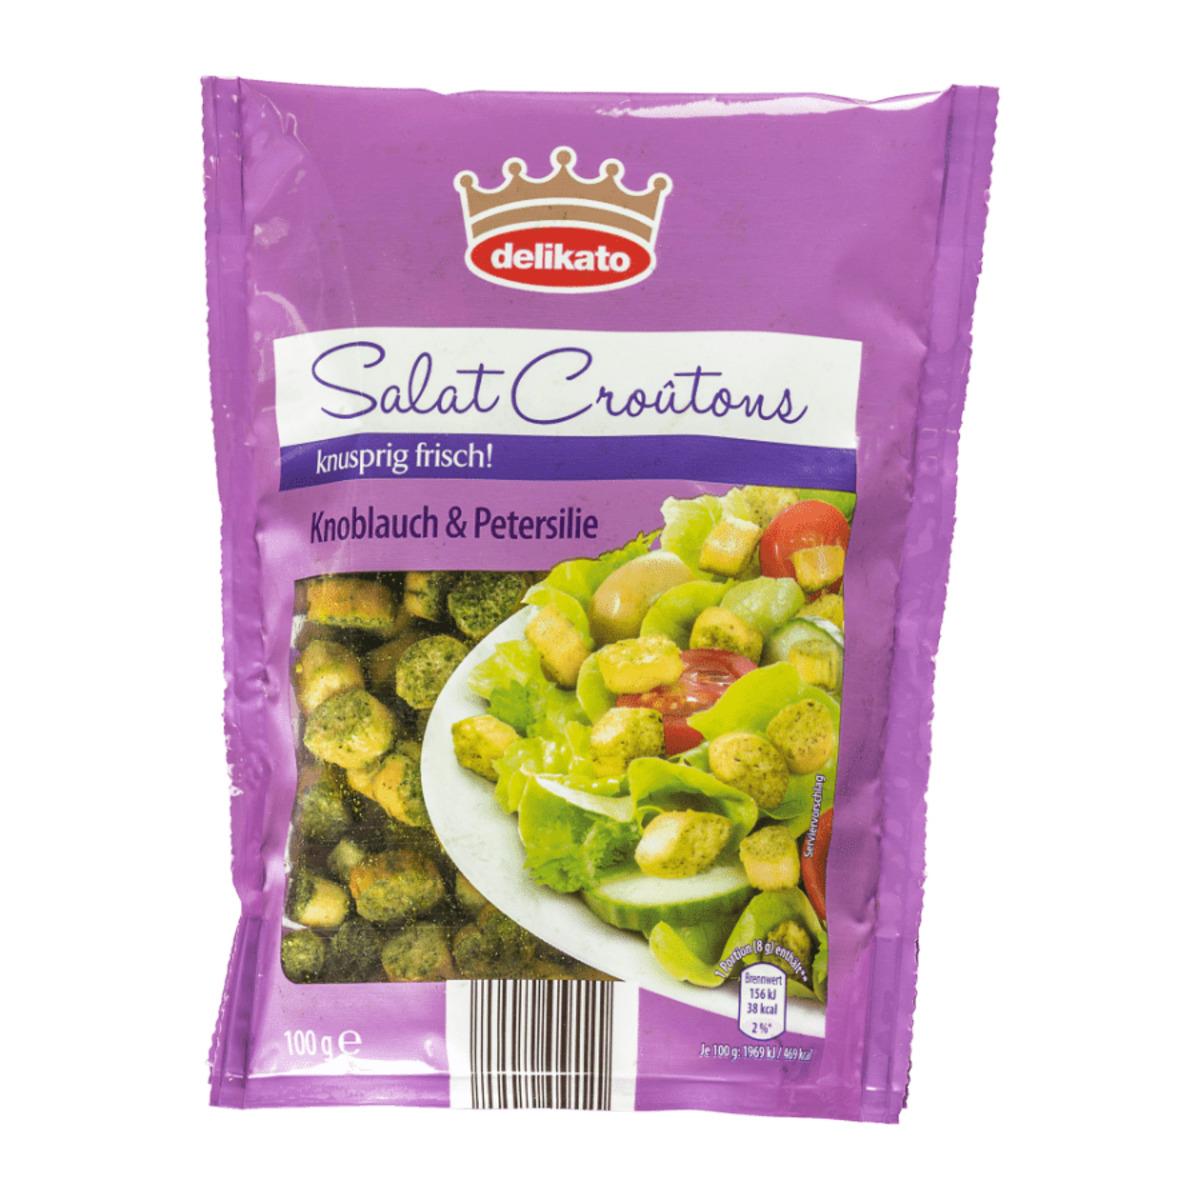 Bild 5 von DELIKATO     Salat Croûtons